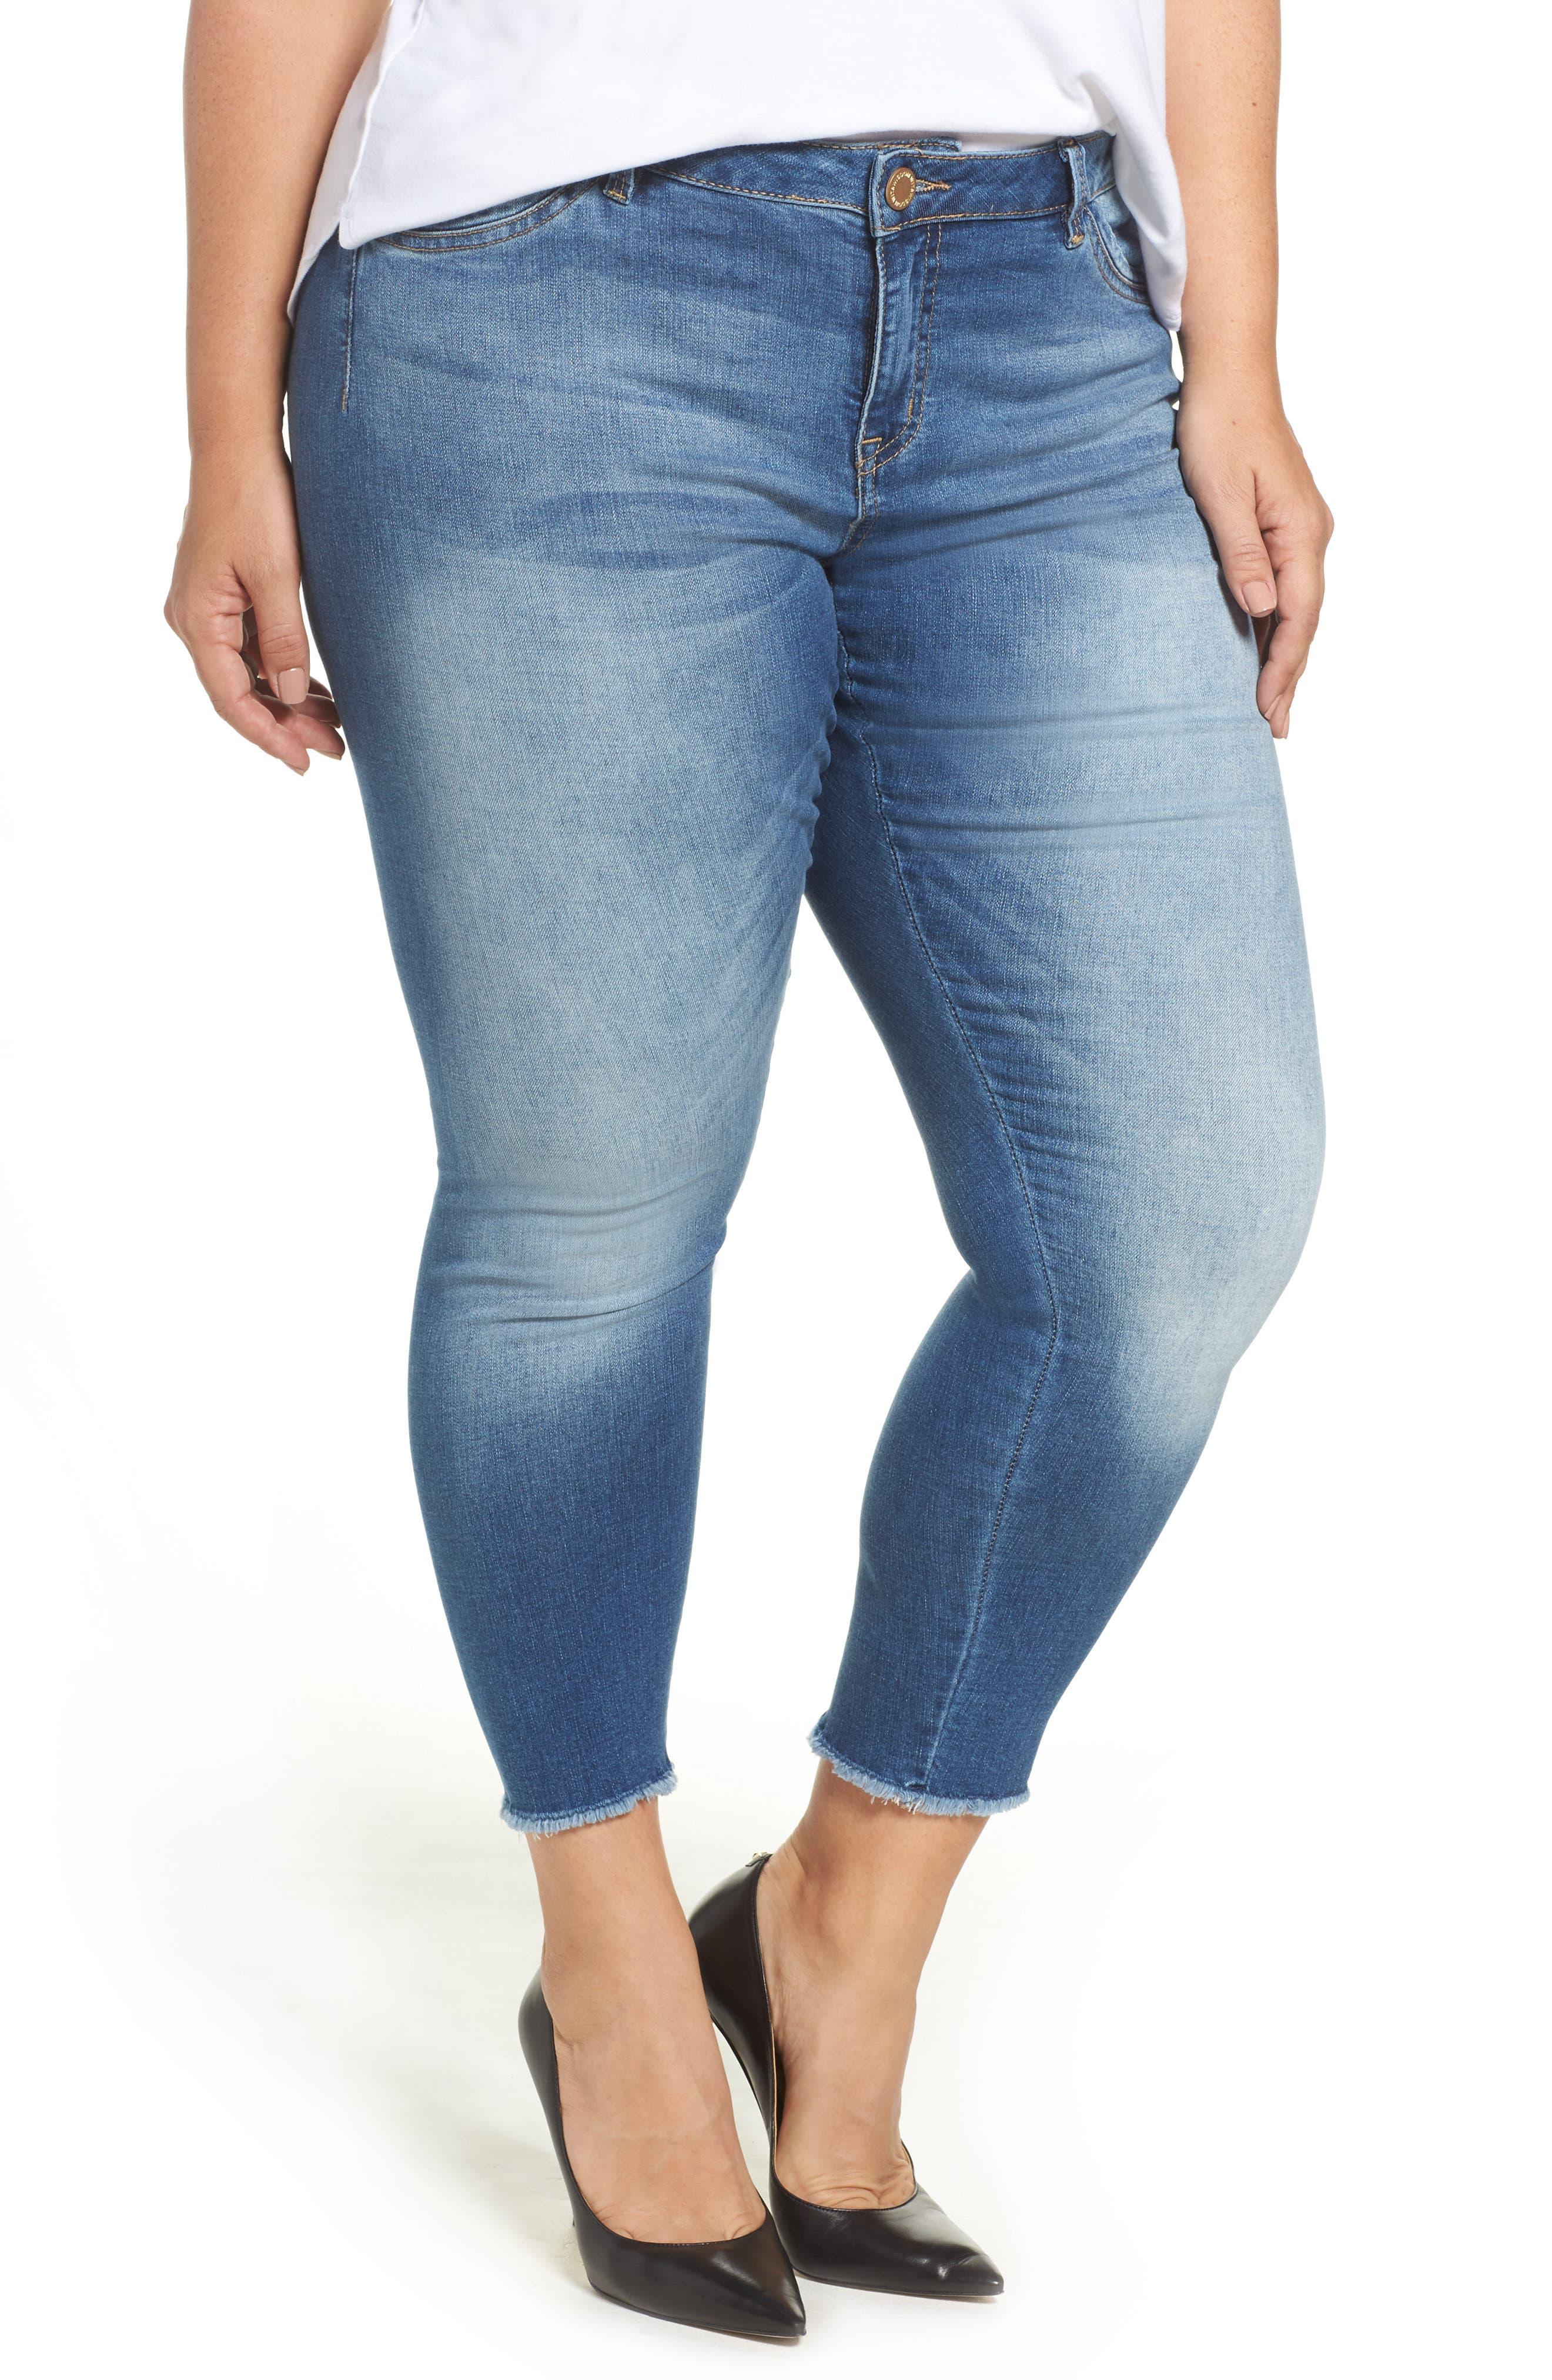 Main Image - Wit & Wisdom Frayed Hem Skinny Jeans (Plus Size) (Nordstrom Exclusive)